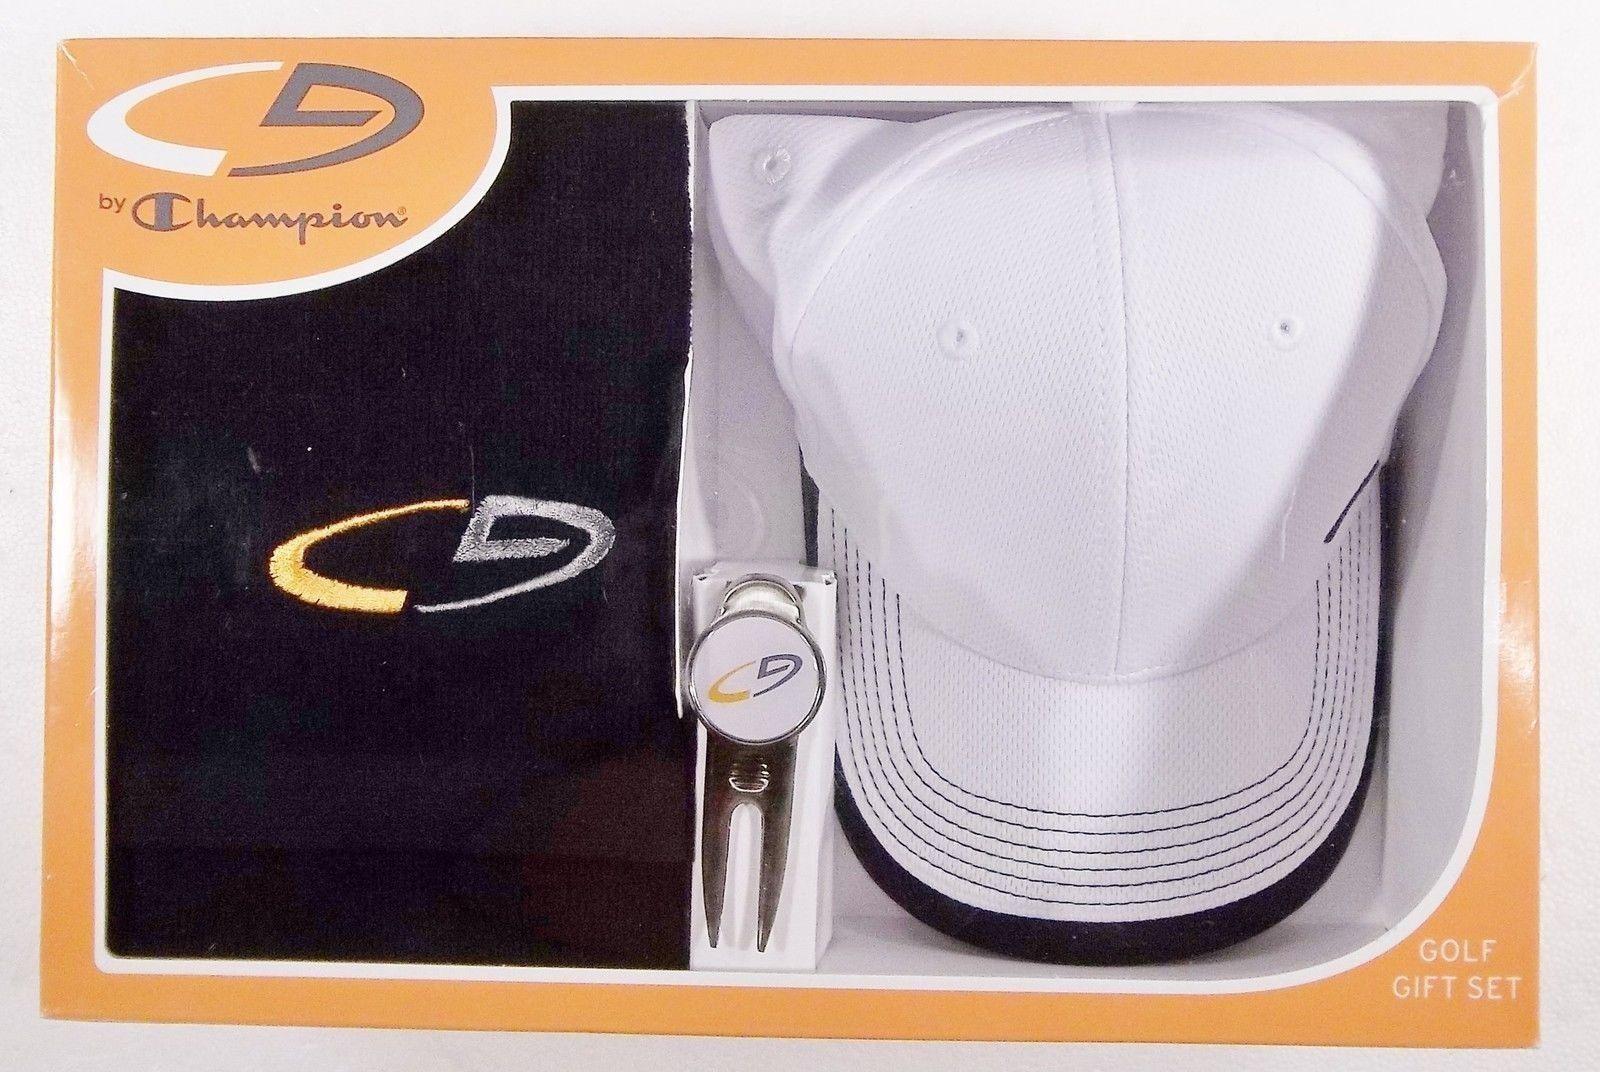 Champion Golf Gift Set/ Retail 24.00